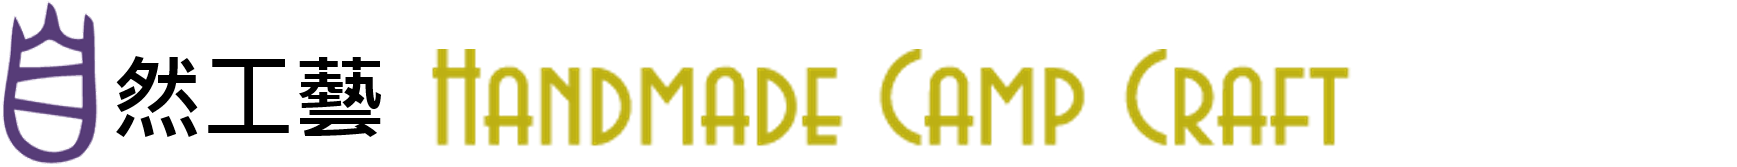 handmadeCampCraft2